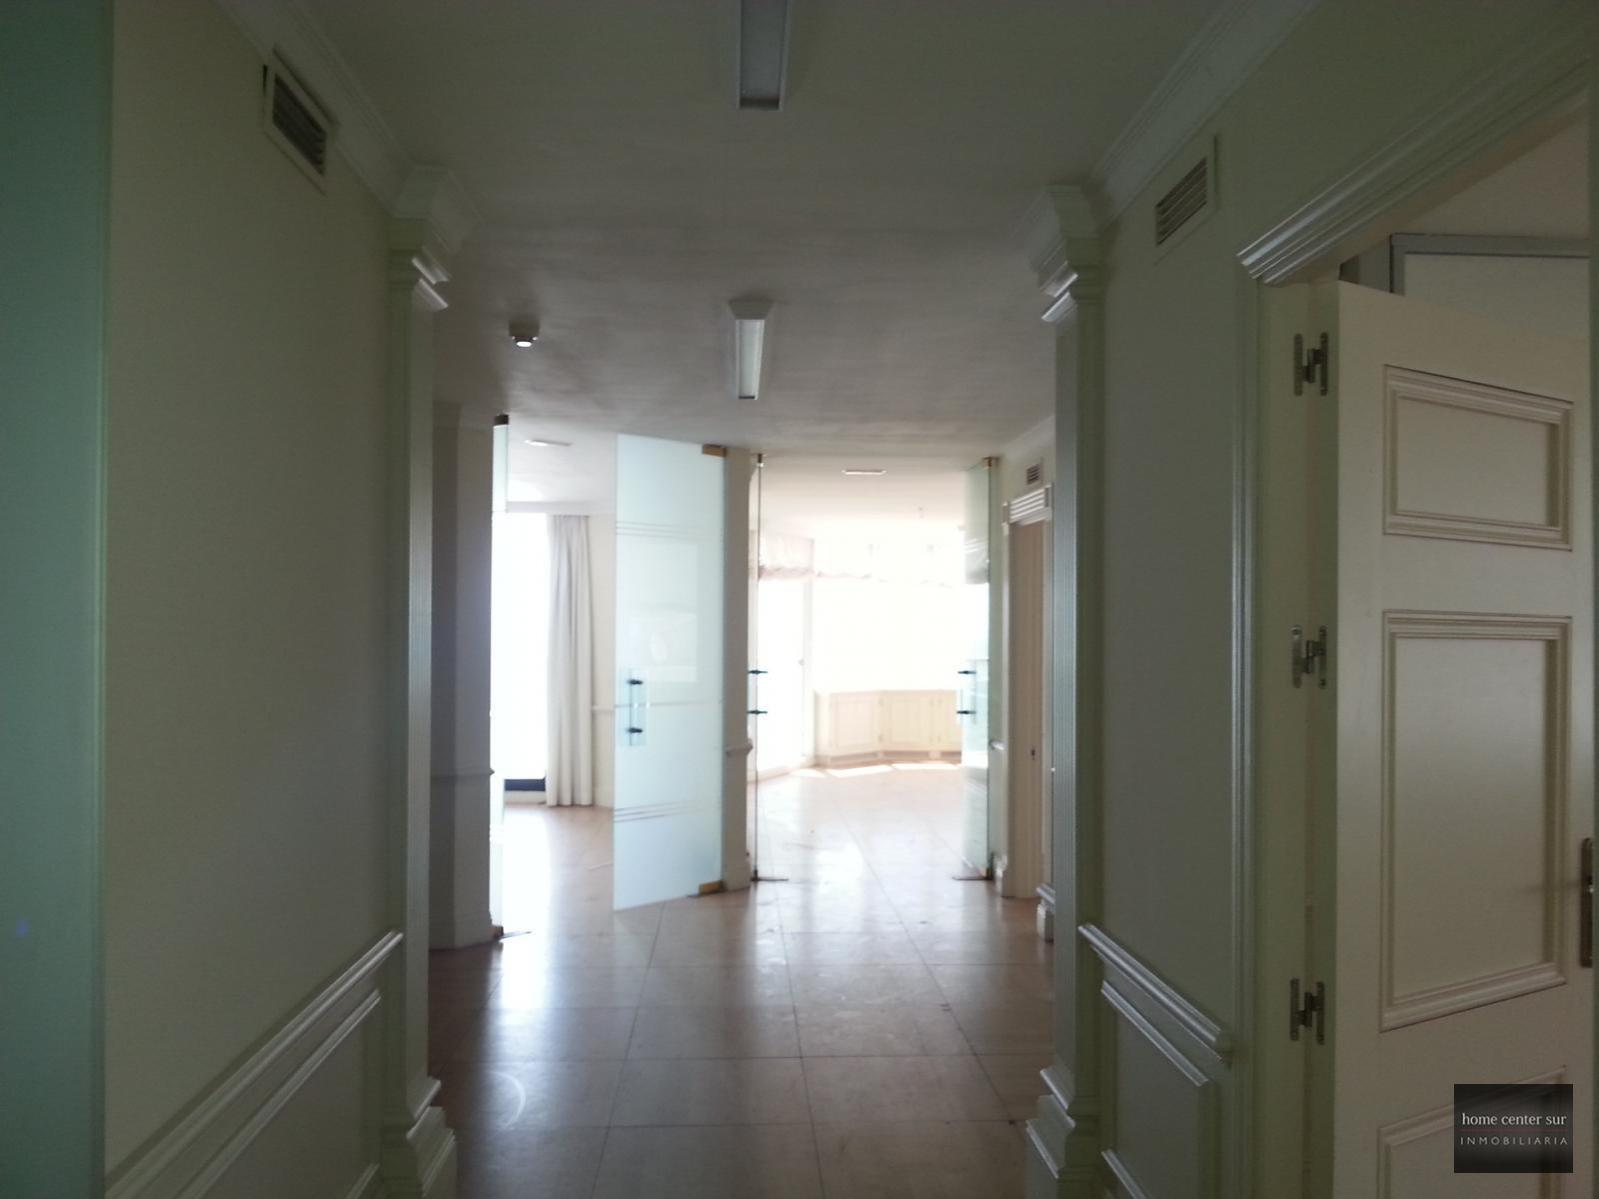 Oficina en alquiler en Avenida Severo Ochoa 30 (Marbella), 2.220 €/mes